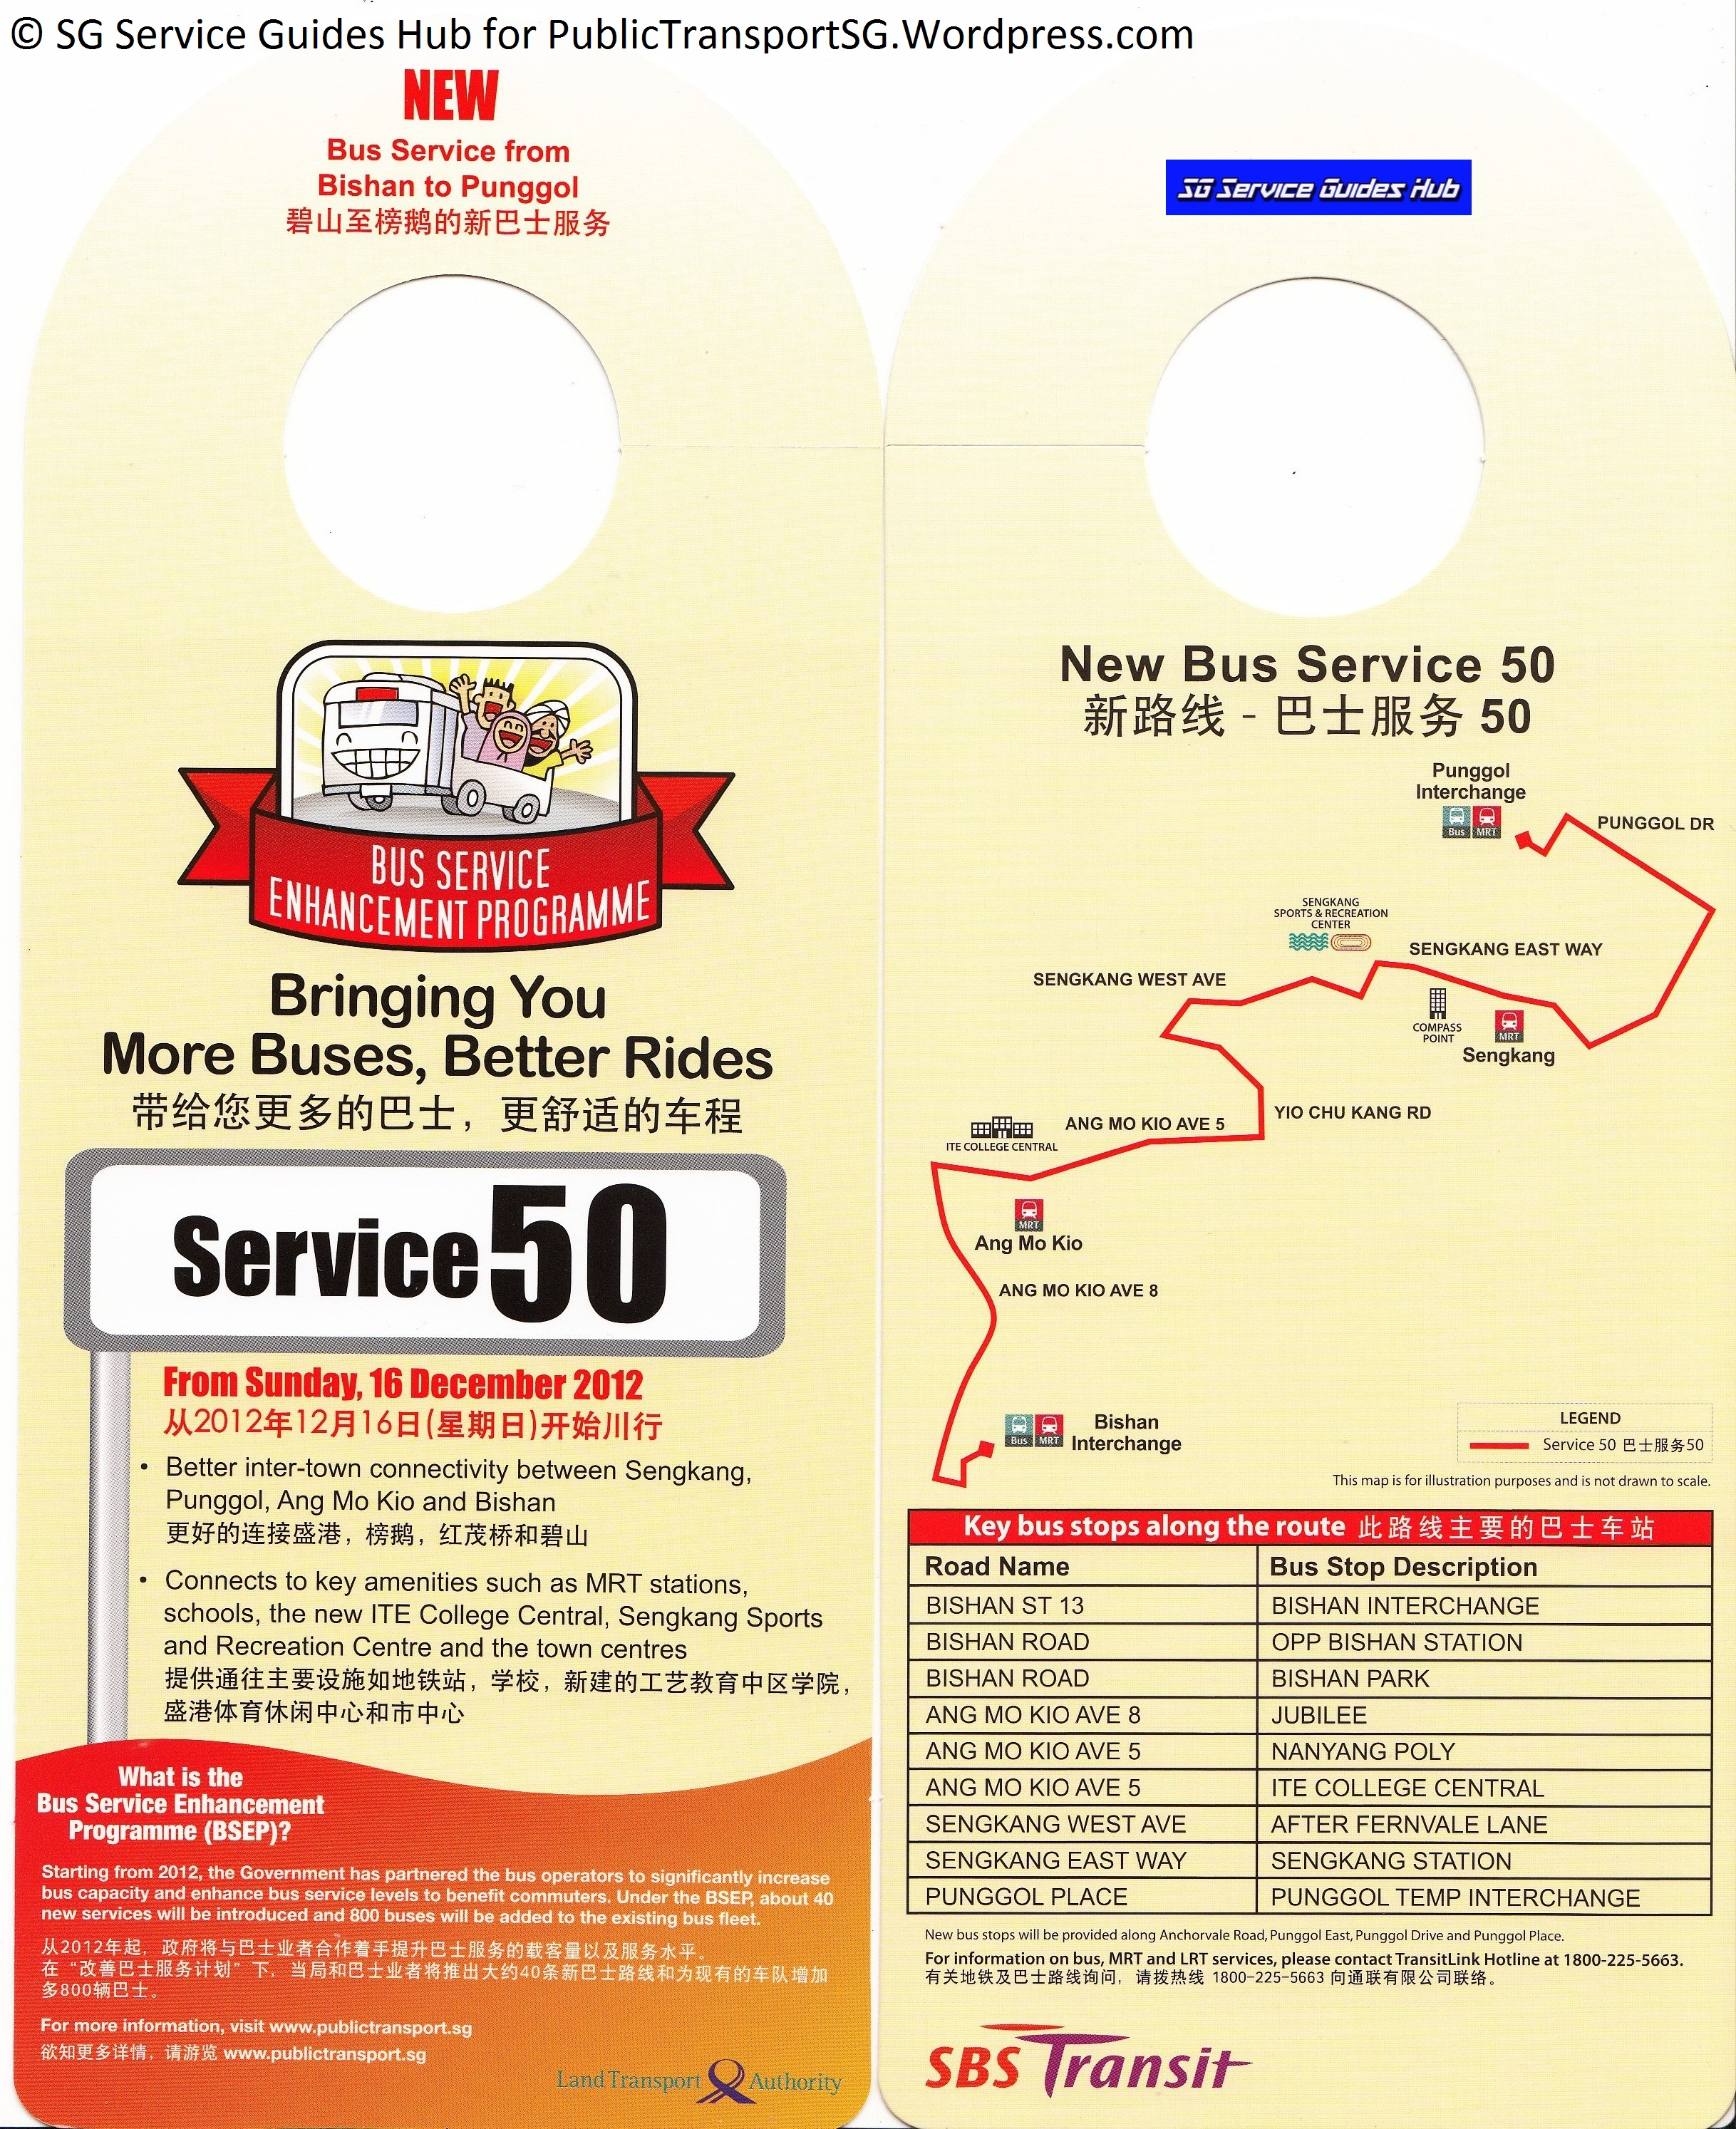 BSEP Promotional Hanger for Service 50